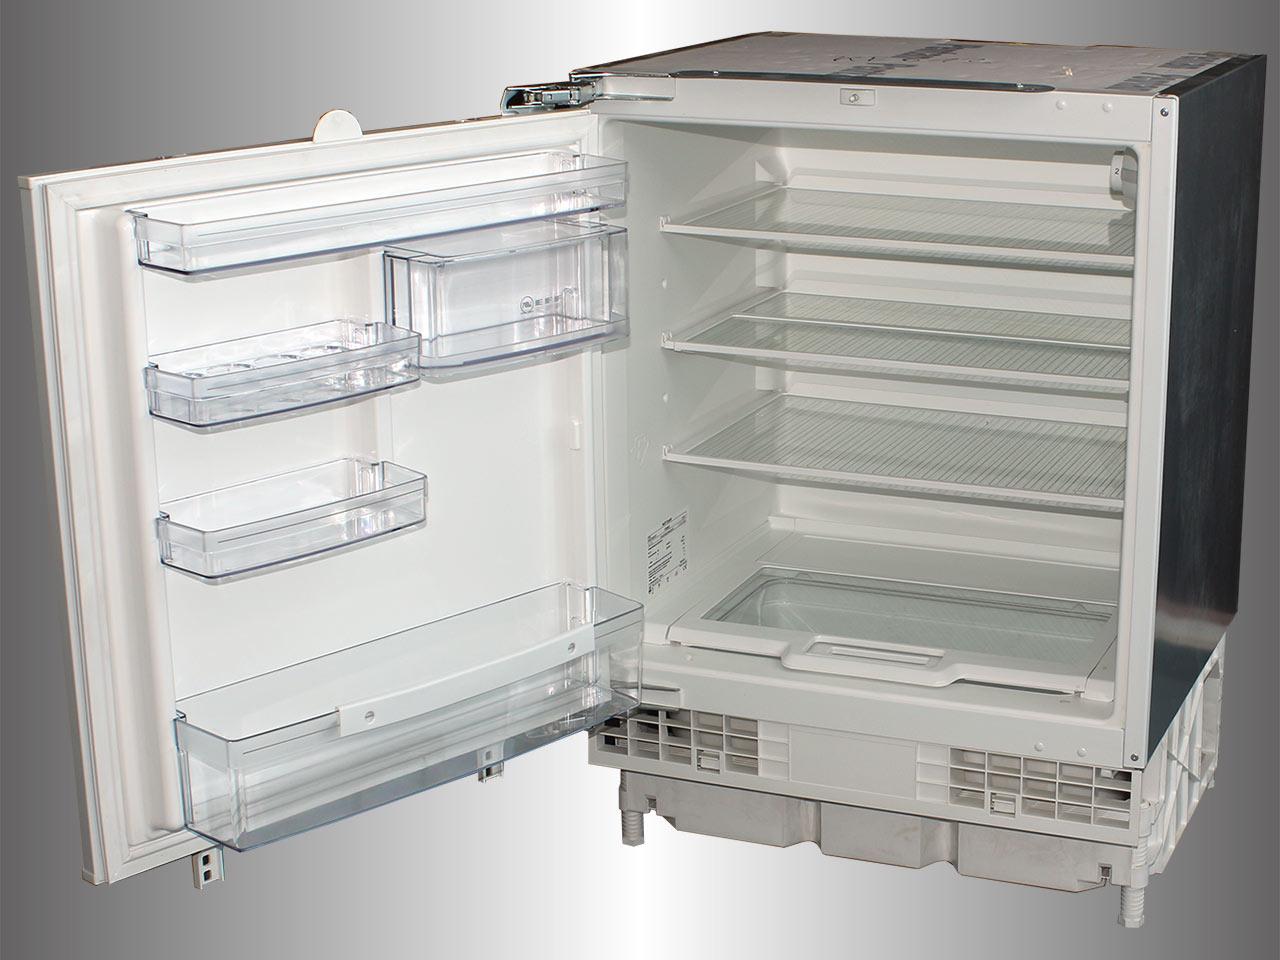 Kühlschrank Unterbaufähig : Cool unterbau kühlschrank edelstahl gram compact k rg n